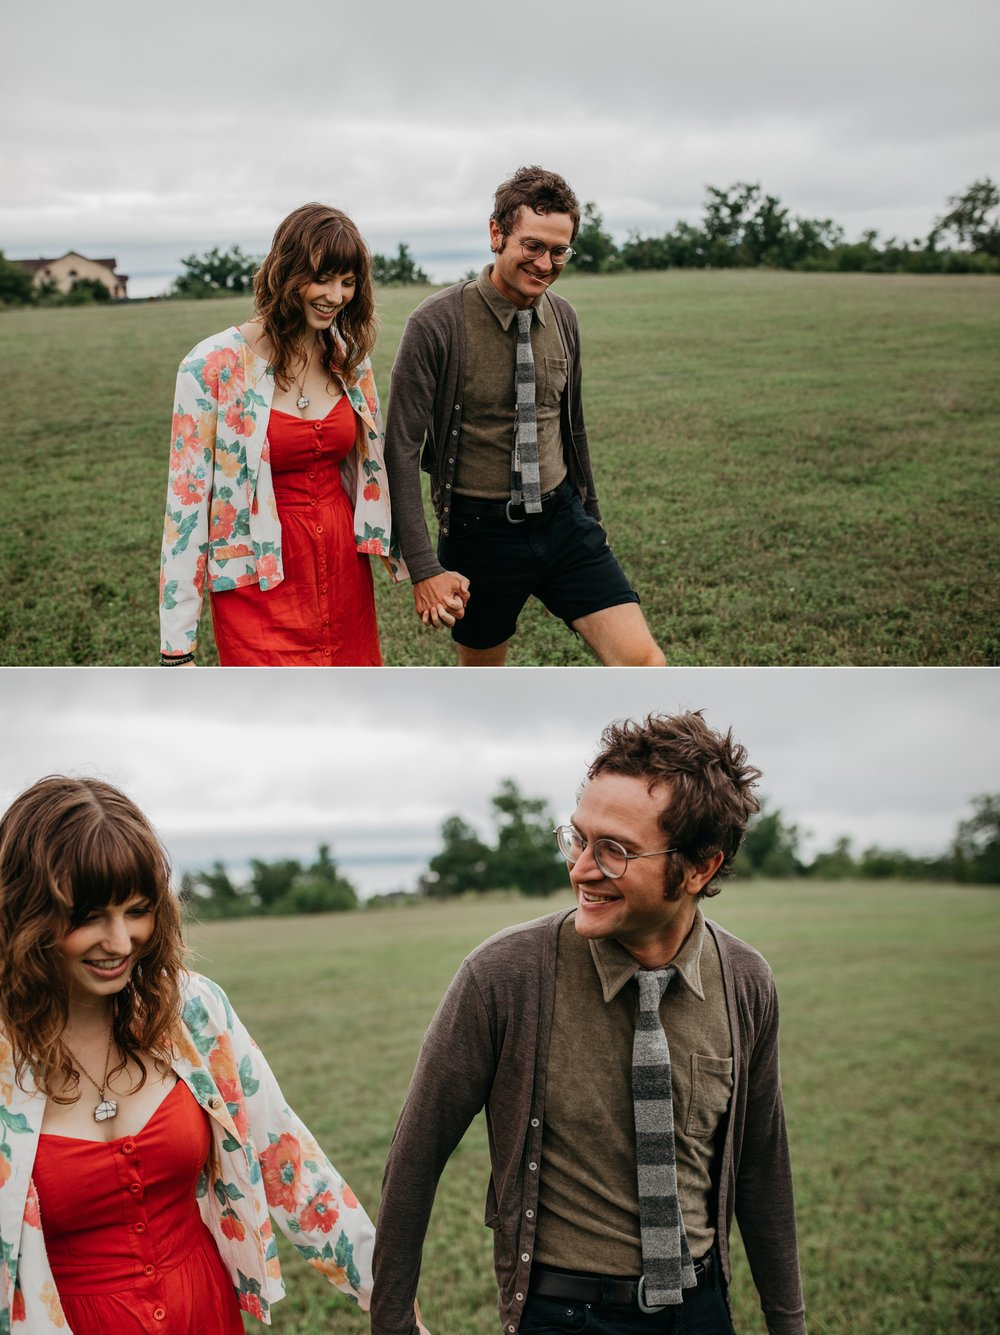 mandy aaron engagement minneapolis minnesota texas austin wedding elopement destination intimate best photographer_0096.jpg